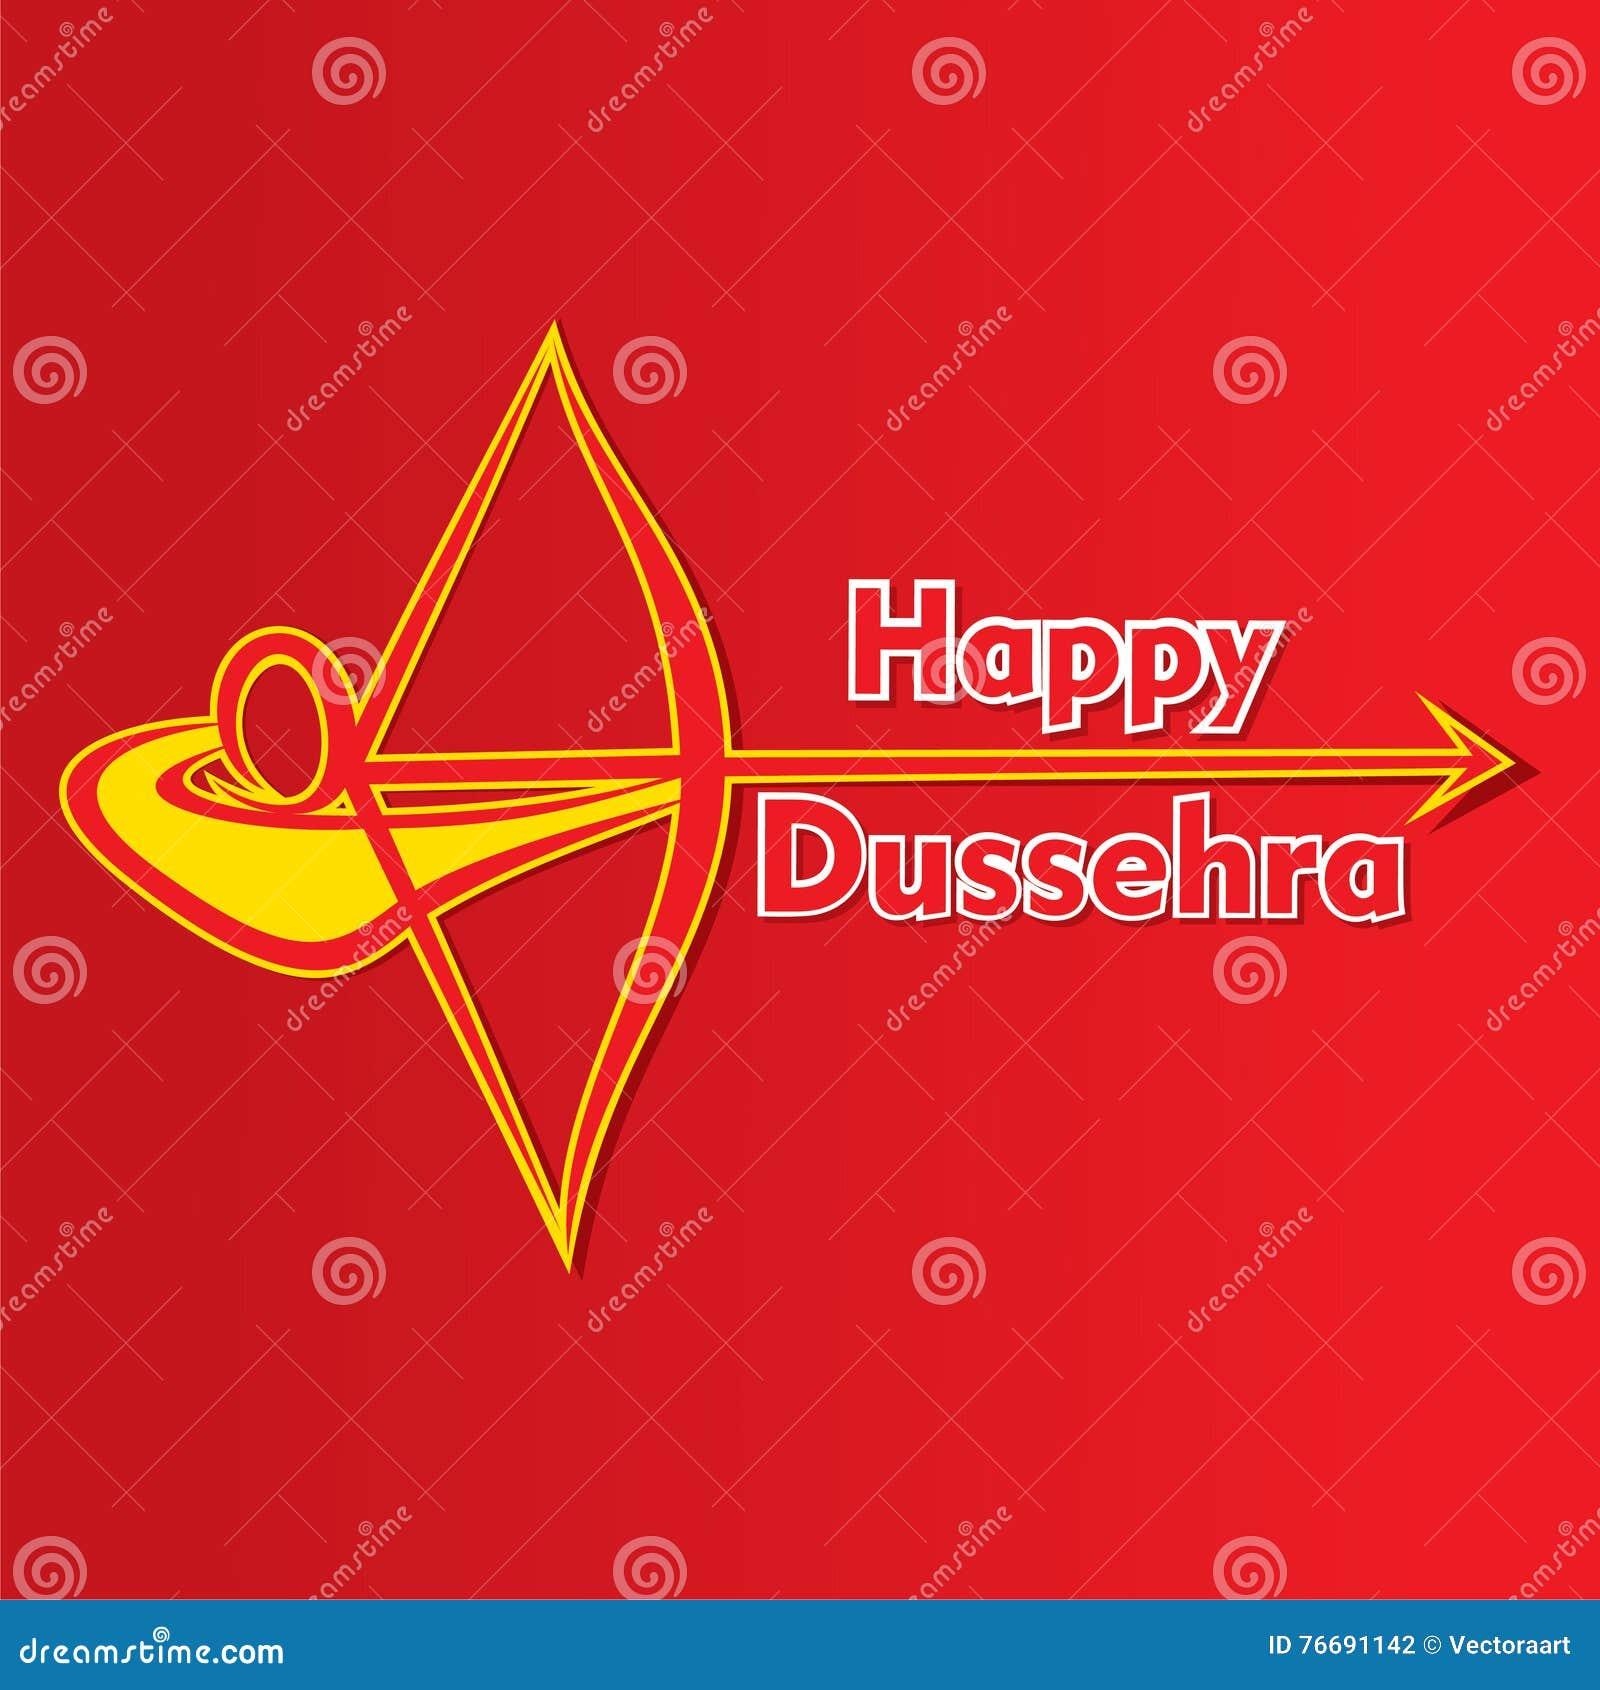 Happy Dussehra Greeting Card Design Stock Vector Illustration Of